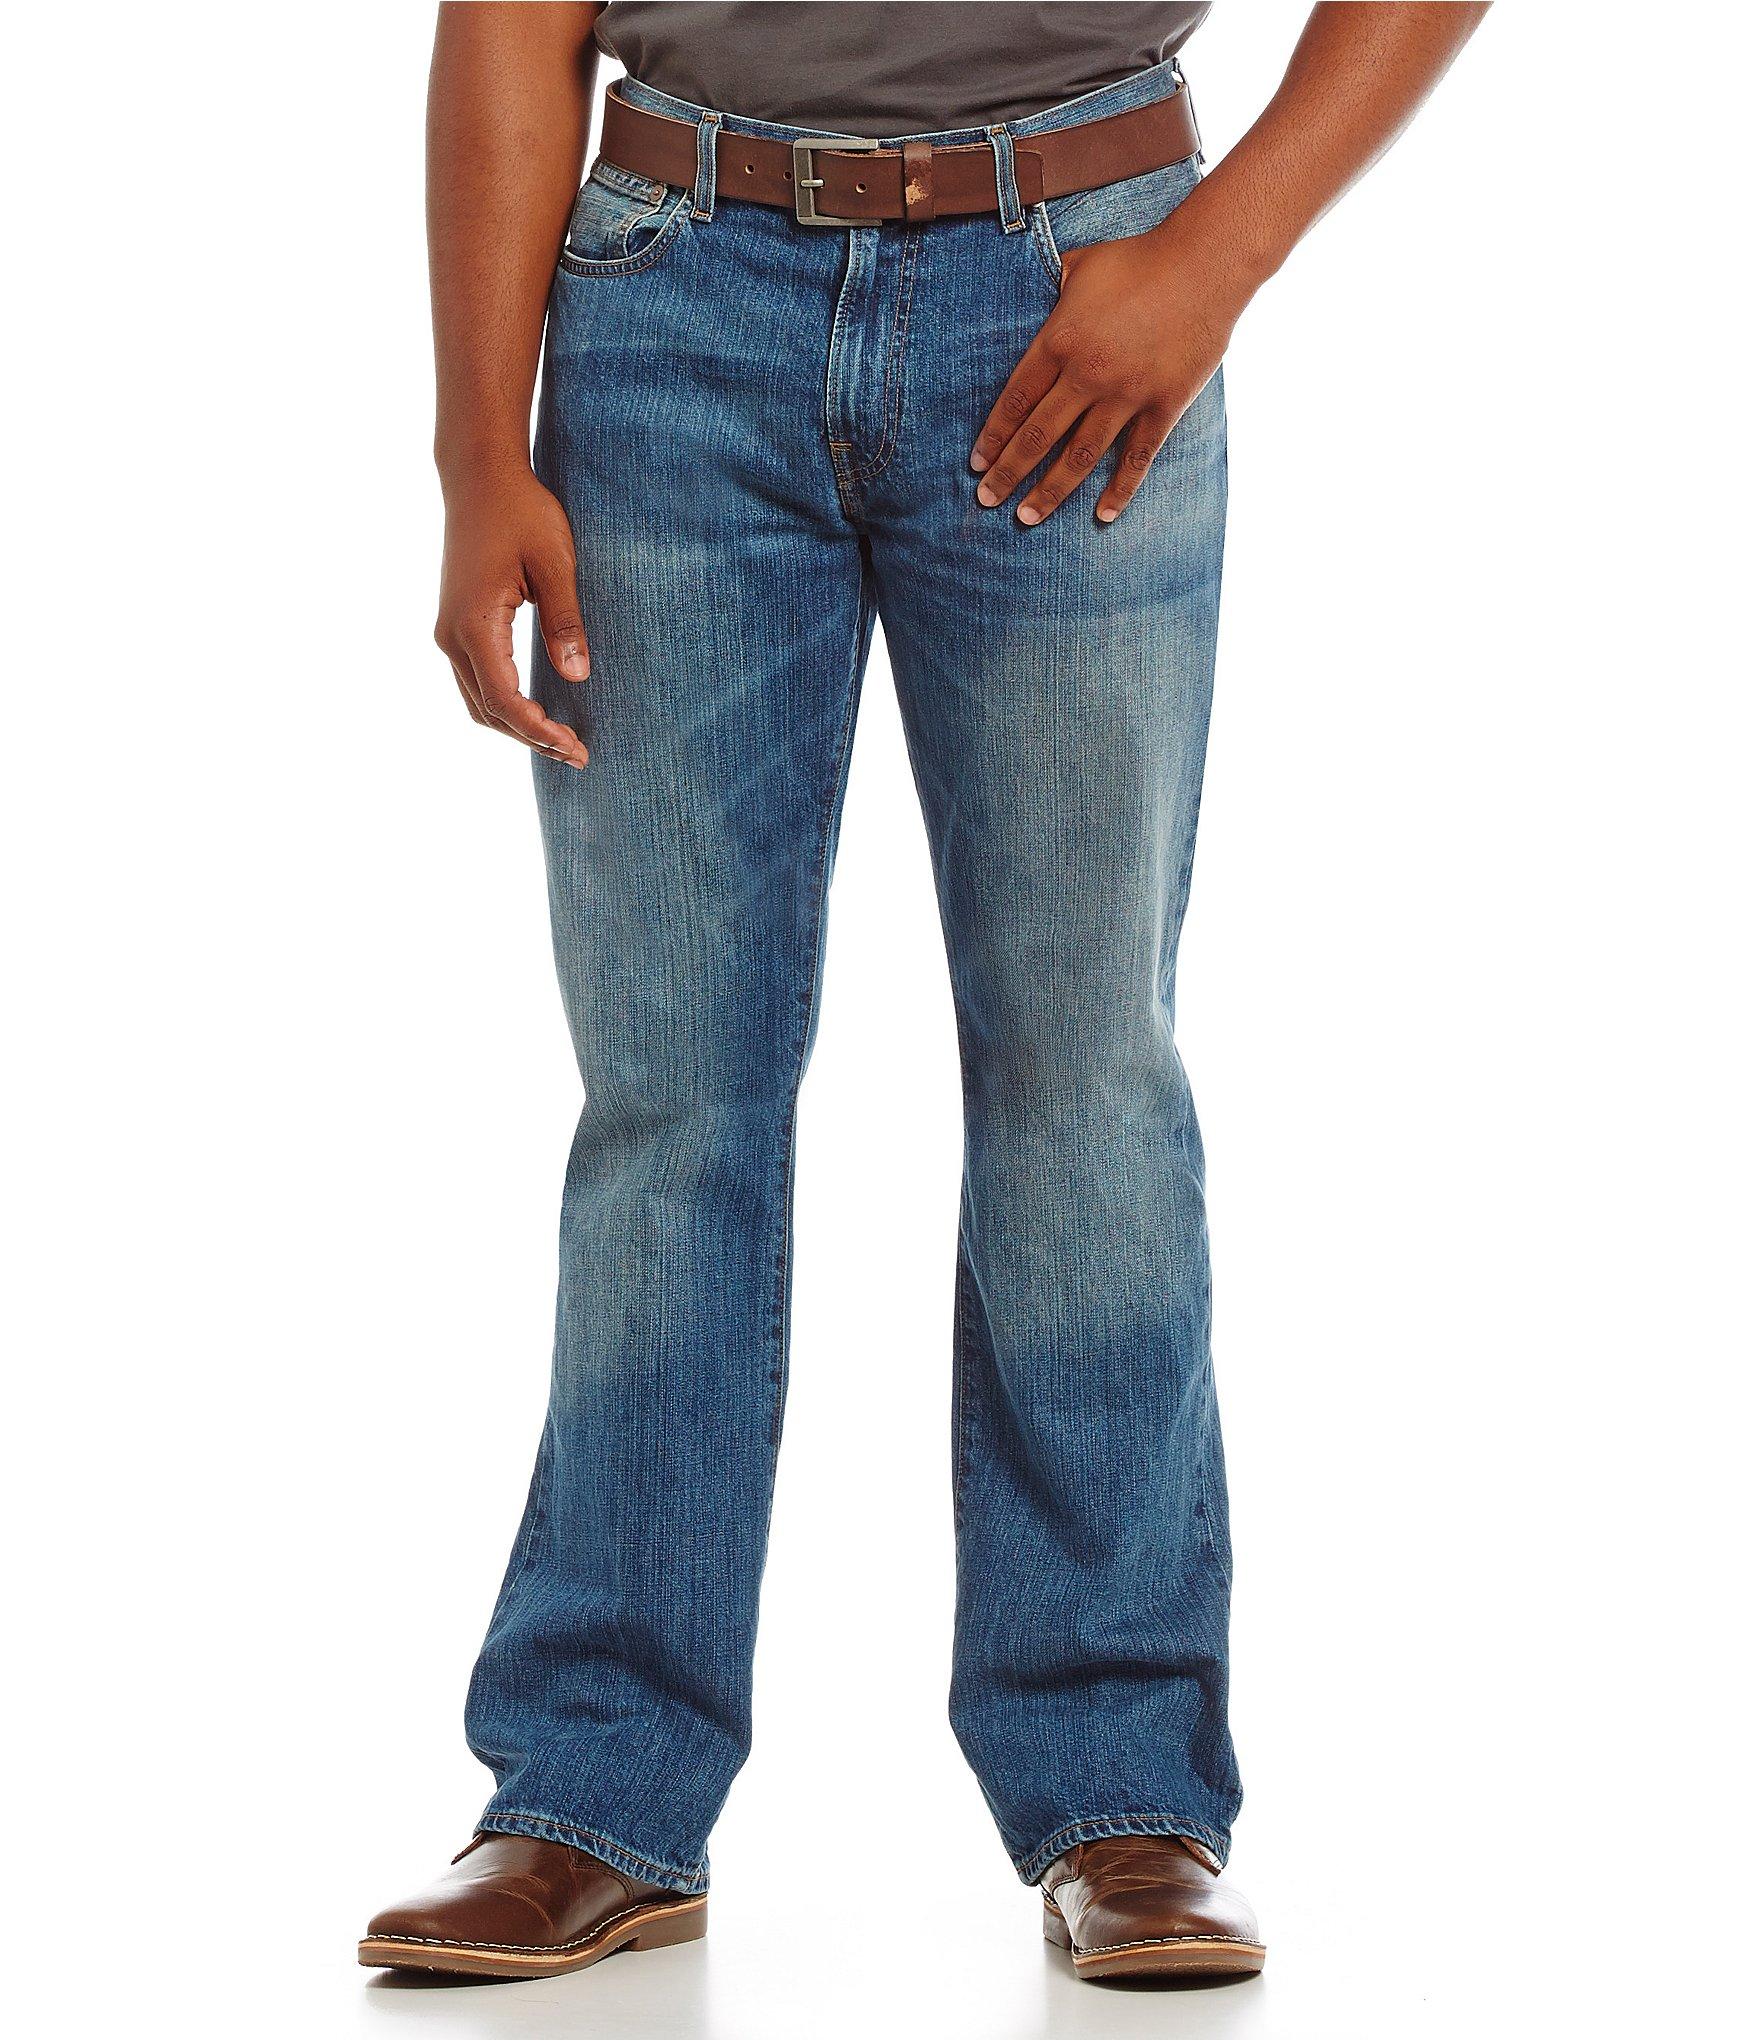 cremieux jeans bootcut jeans dillards. Black Bedroom Furniture Sets. Home Design Ideas